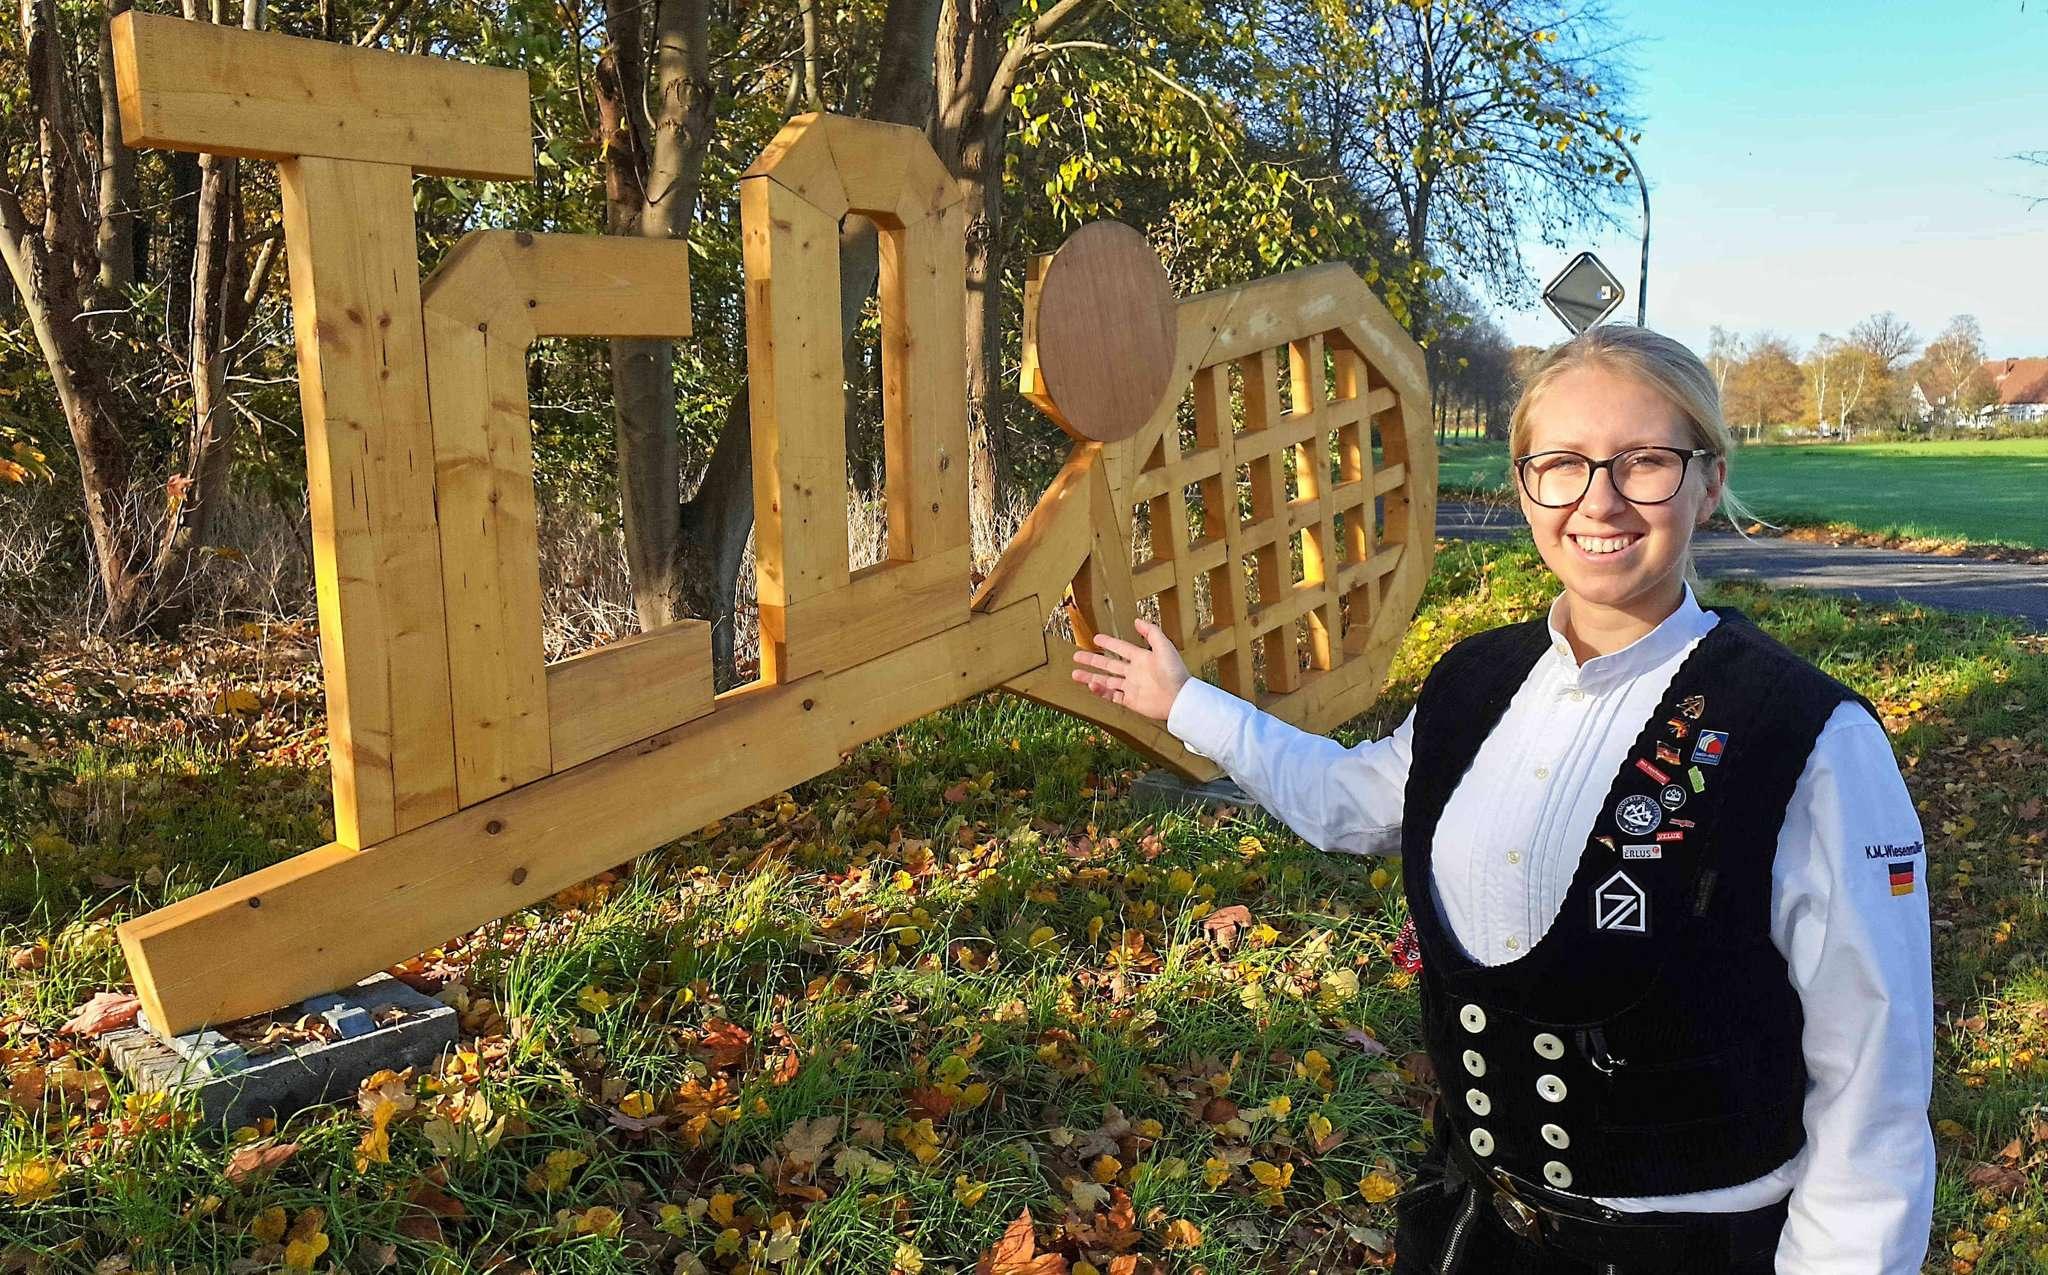 Katja Wiesenmüller mit selbst gebautem Holzemblem. Foto: Tobias Woelki